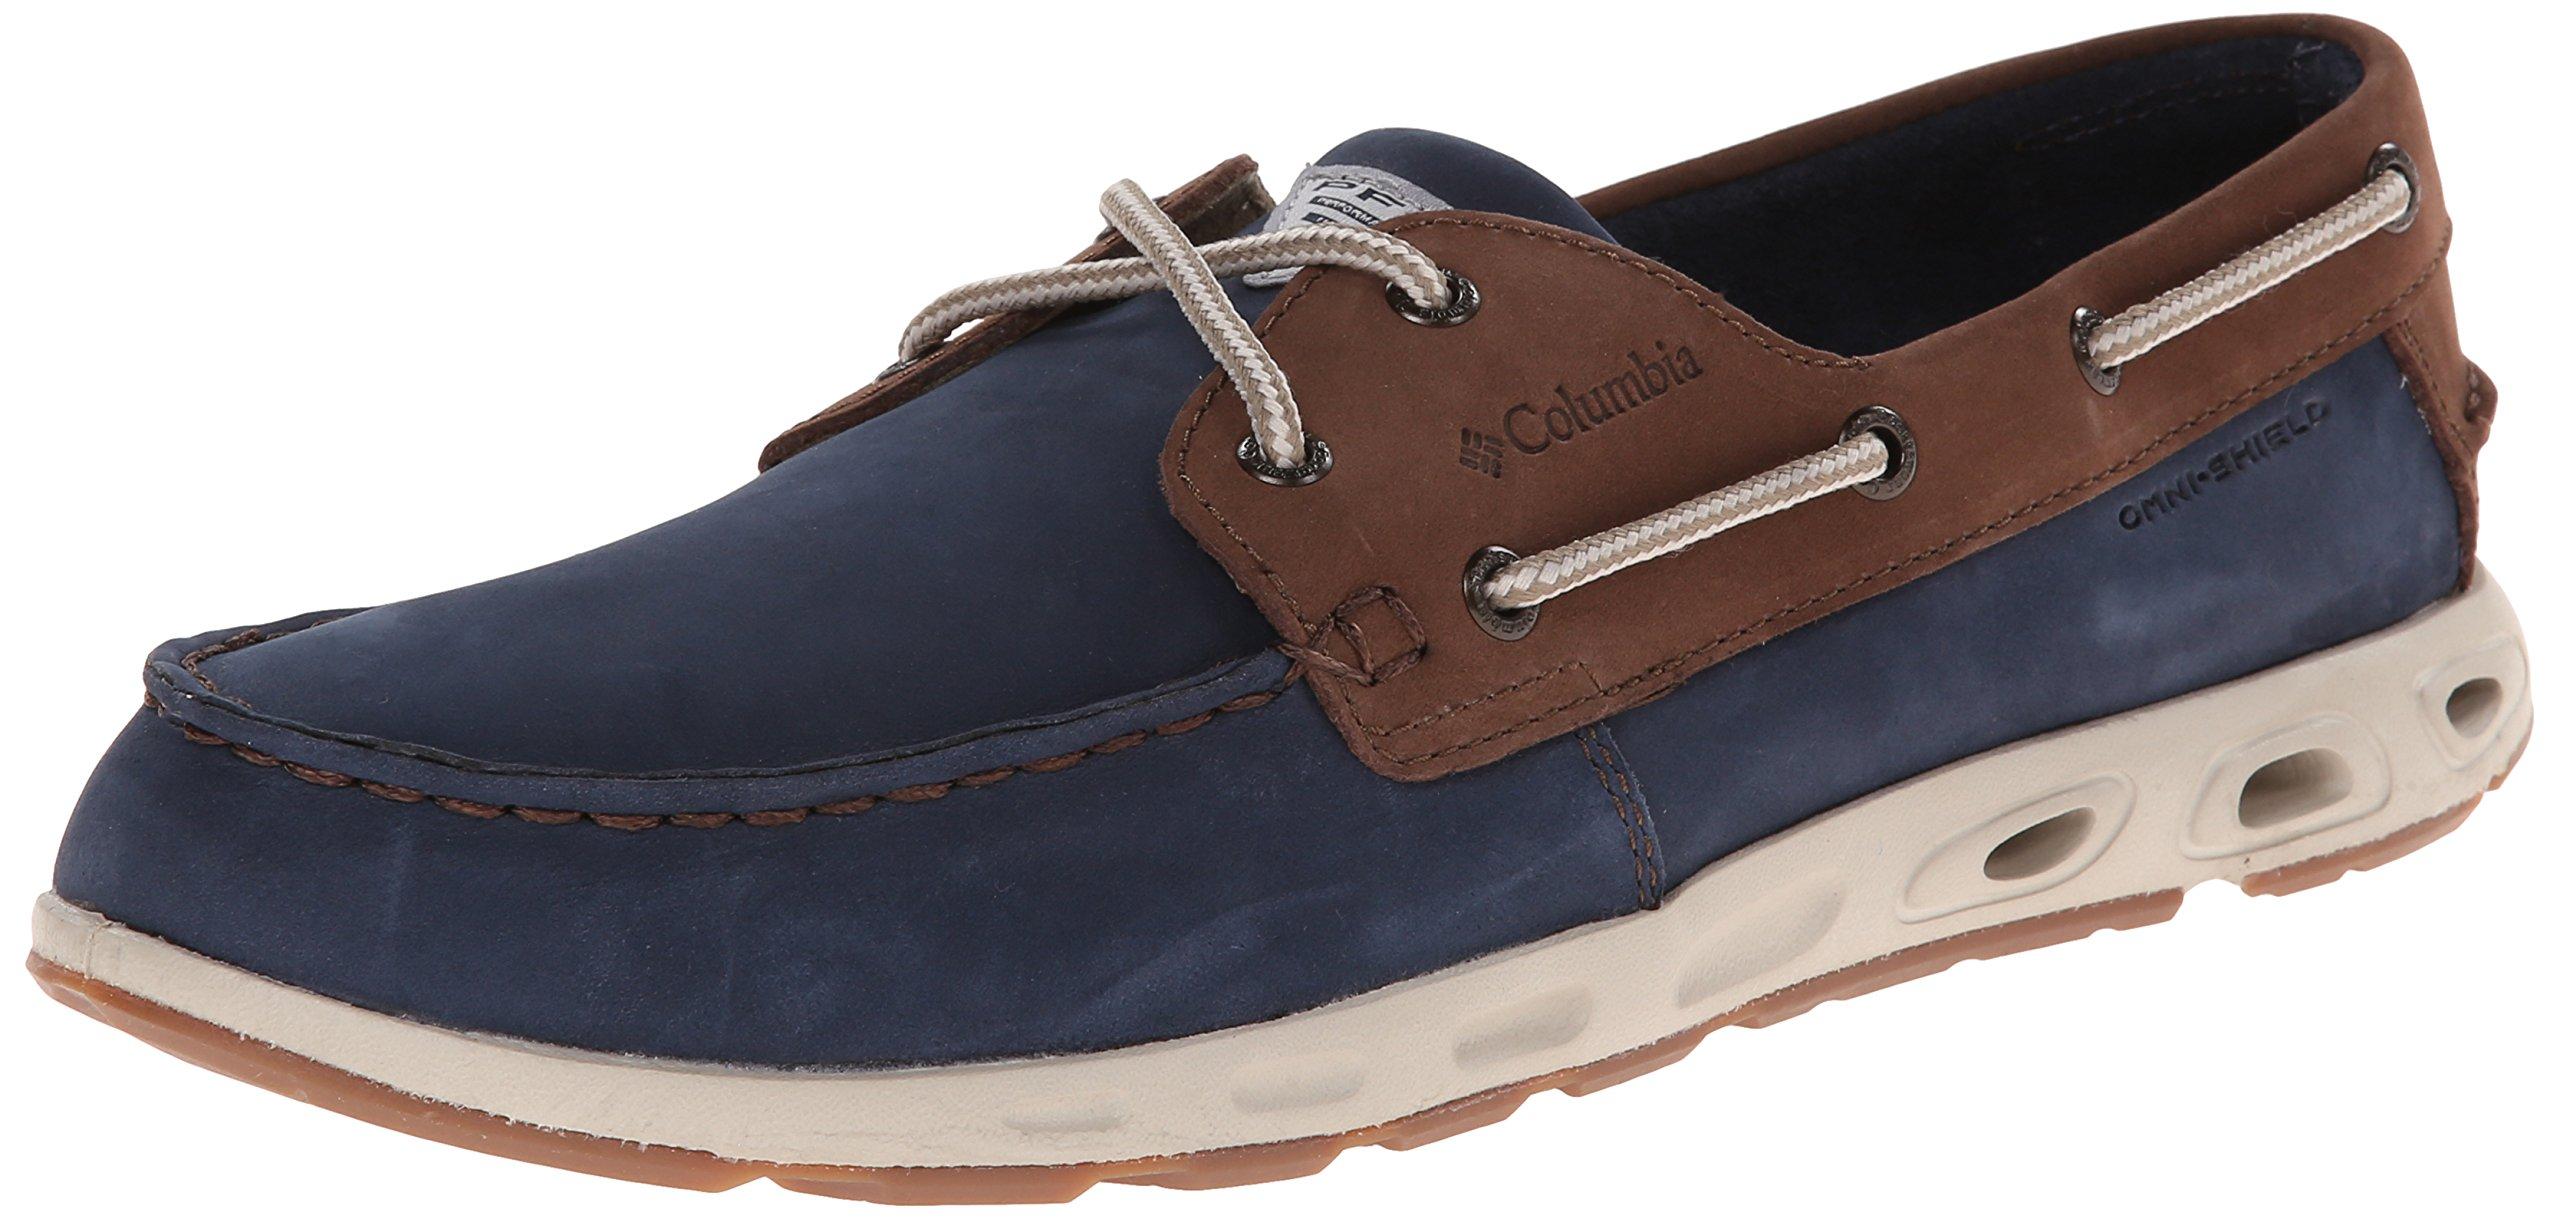 Columbia PFG Men's Bonehead Vent Leather PFG Boat Shoe, Collegiate Navy, Stone, 7.5 Regular US